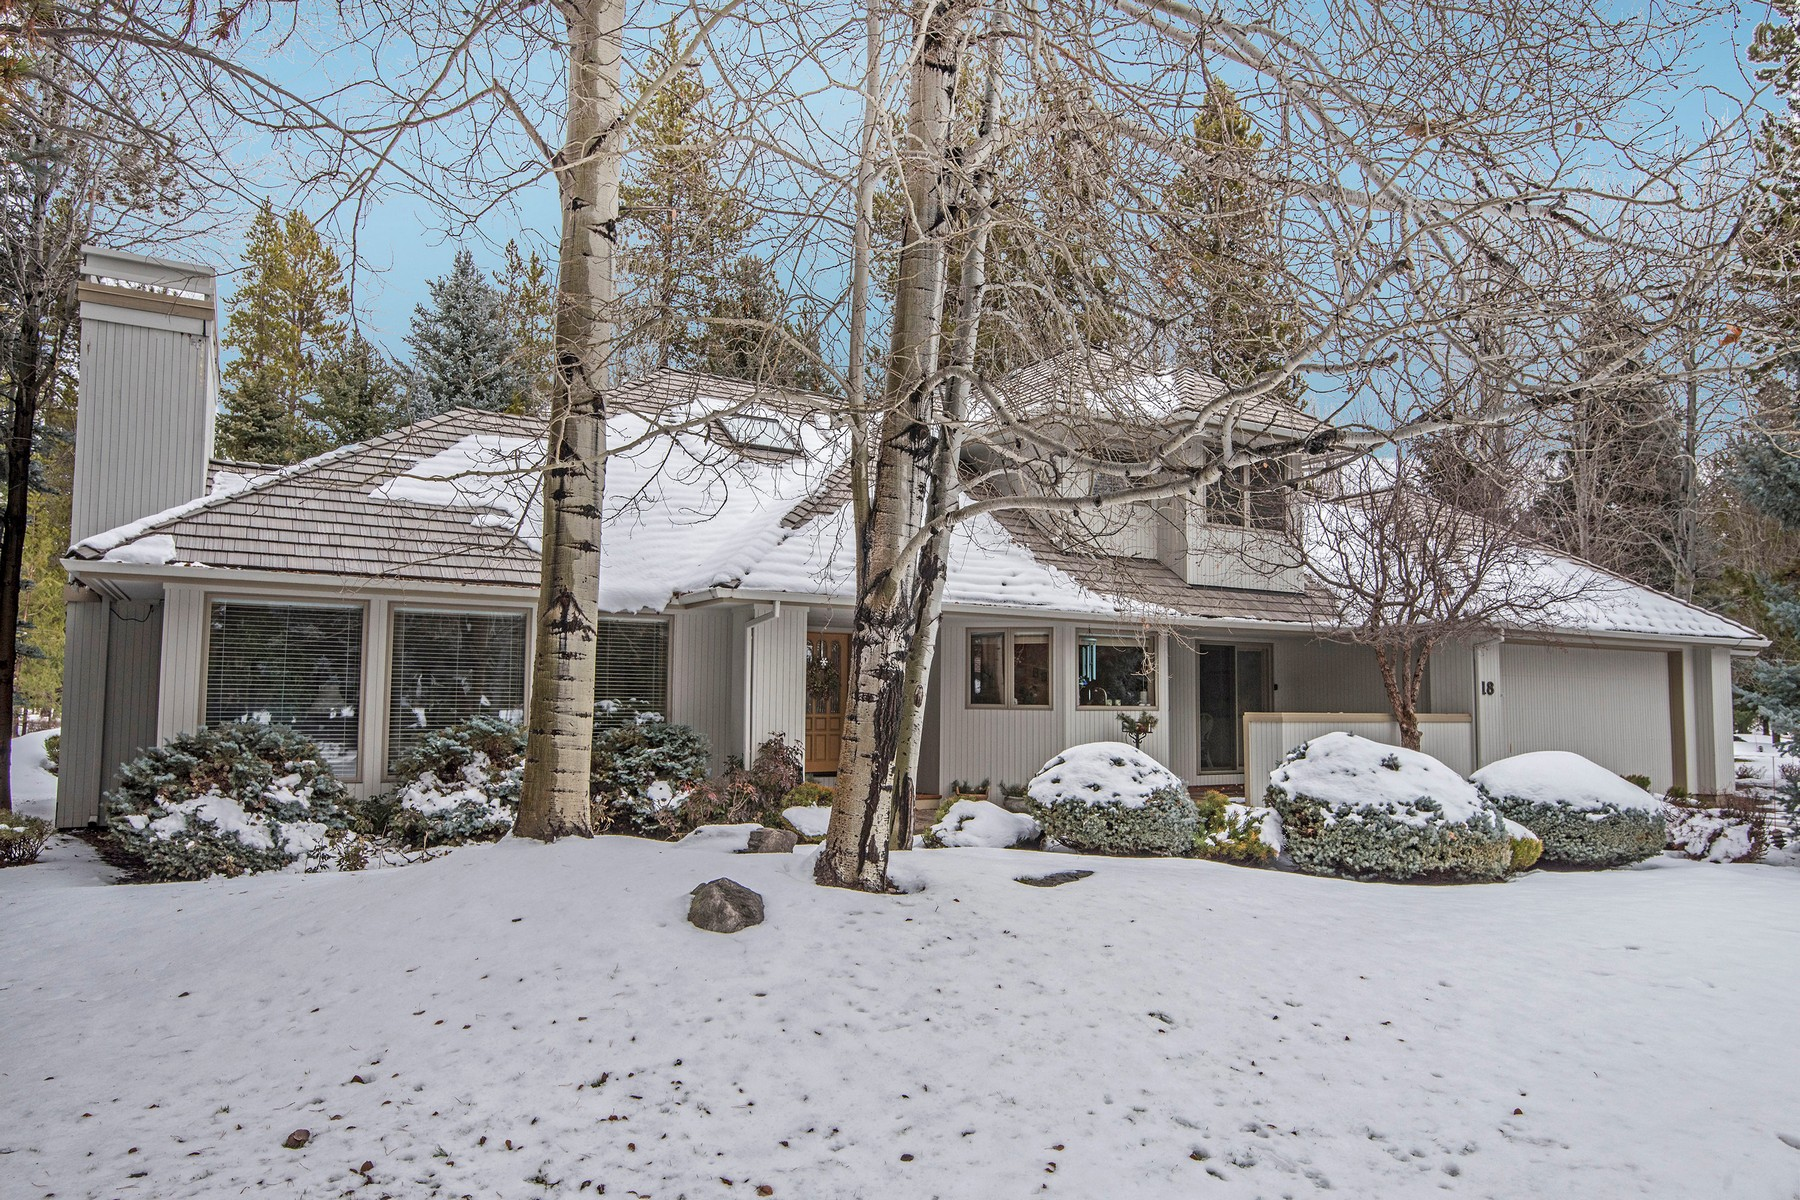 Other Residential Homes για την Πώληση στο 17990 North Course Lane Unit 18 Sunriver, OR 97707 Sunriver, Ορεγκον 97707 Ηνωμένες Πολιτείες